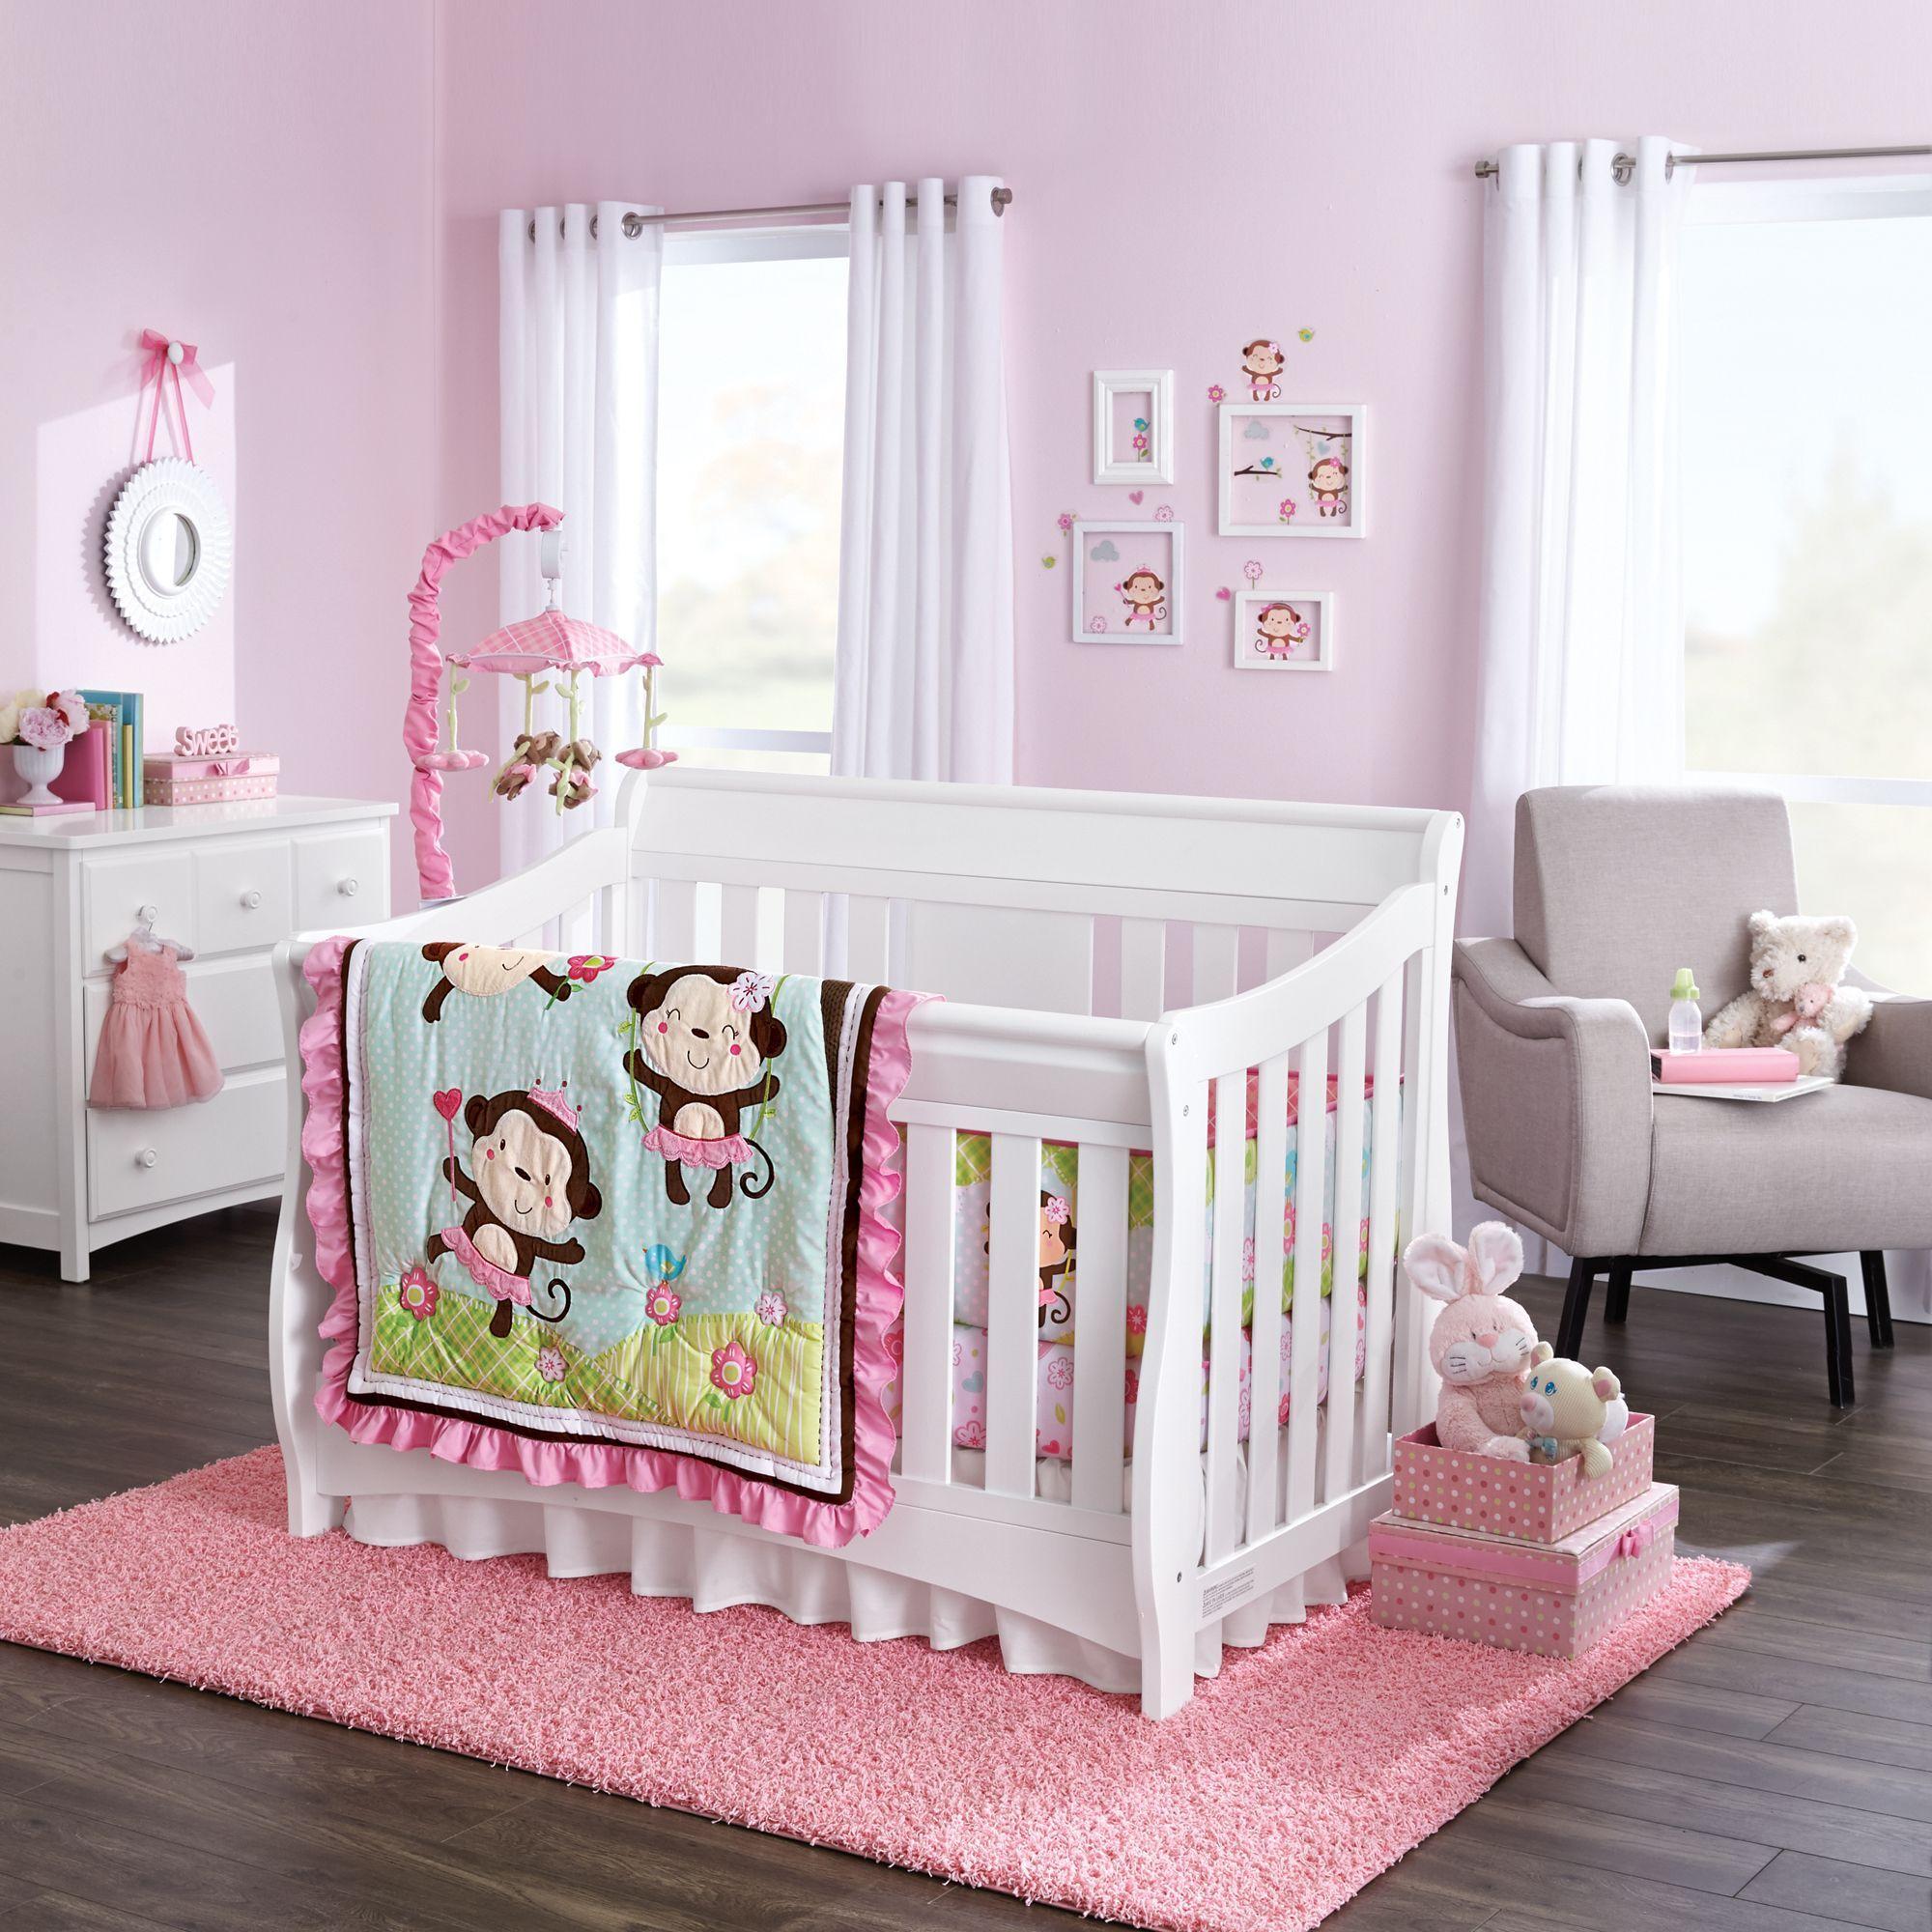 Delta® 'Oberon' 4In1 Convertible Crib Buying